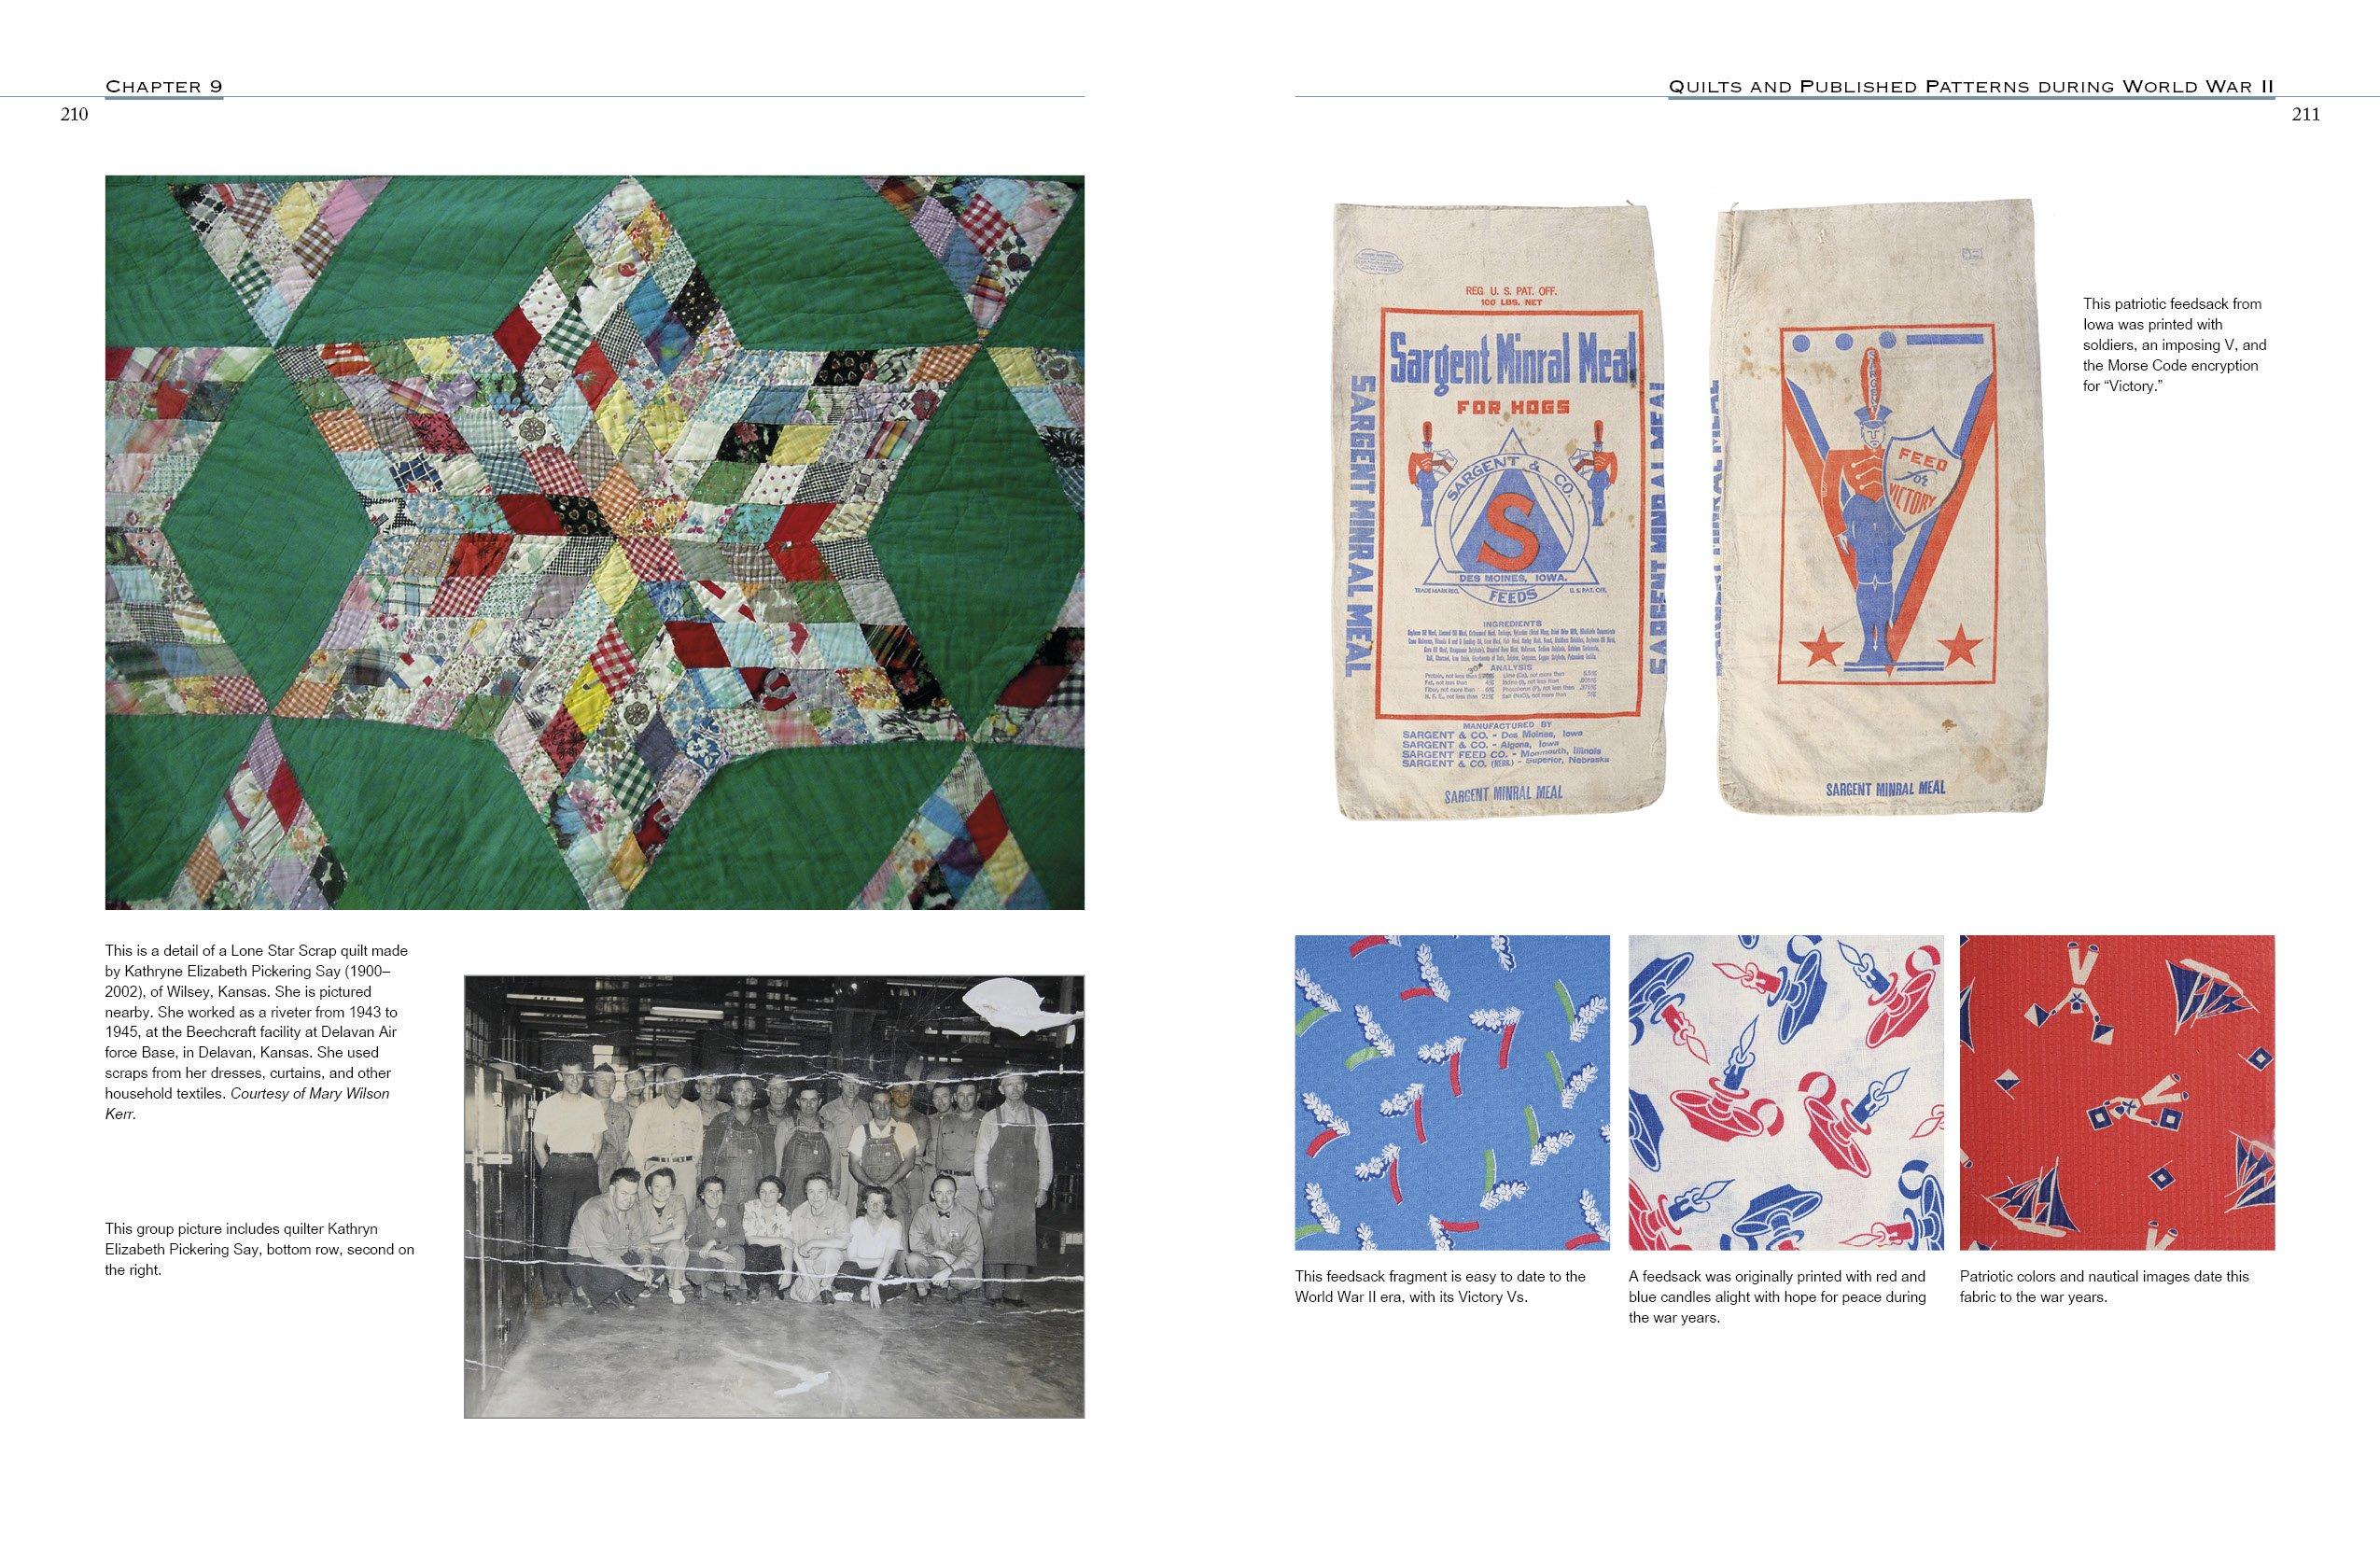 World War II Quilts by Schiffer (Image #1)